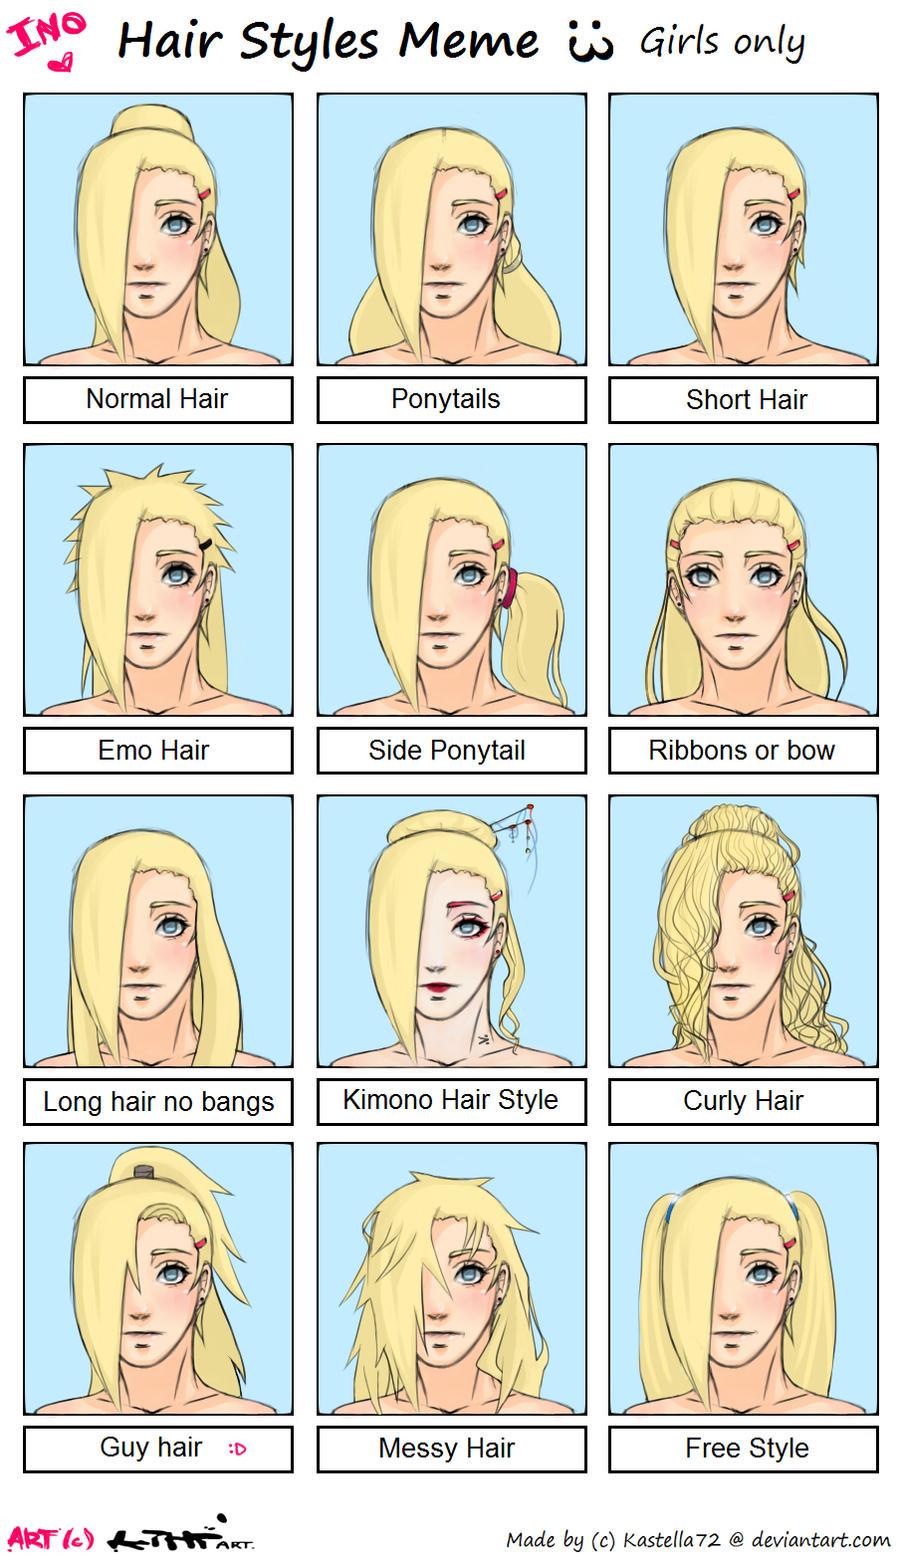 Yamanaka Ino.Hairstyle meme. by Kihiart on DeviantArt